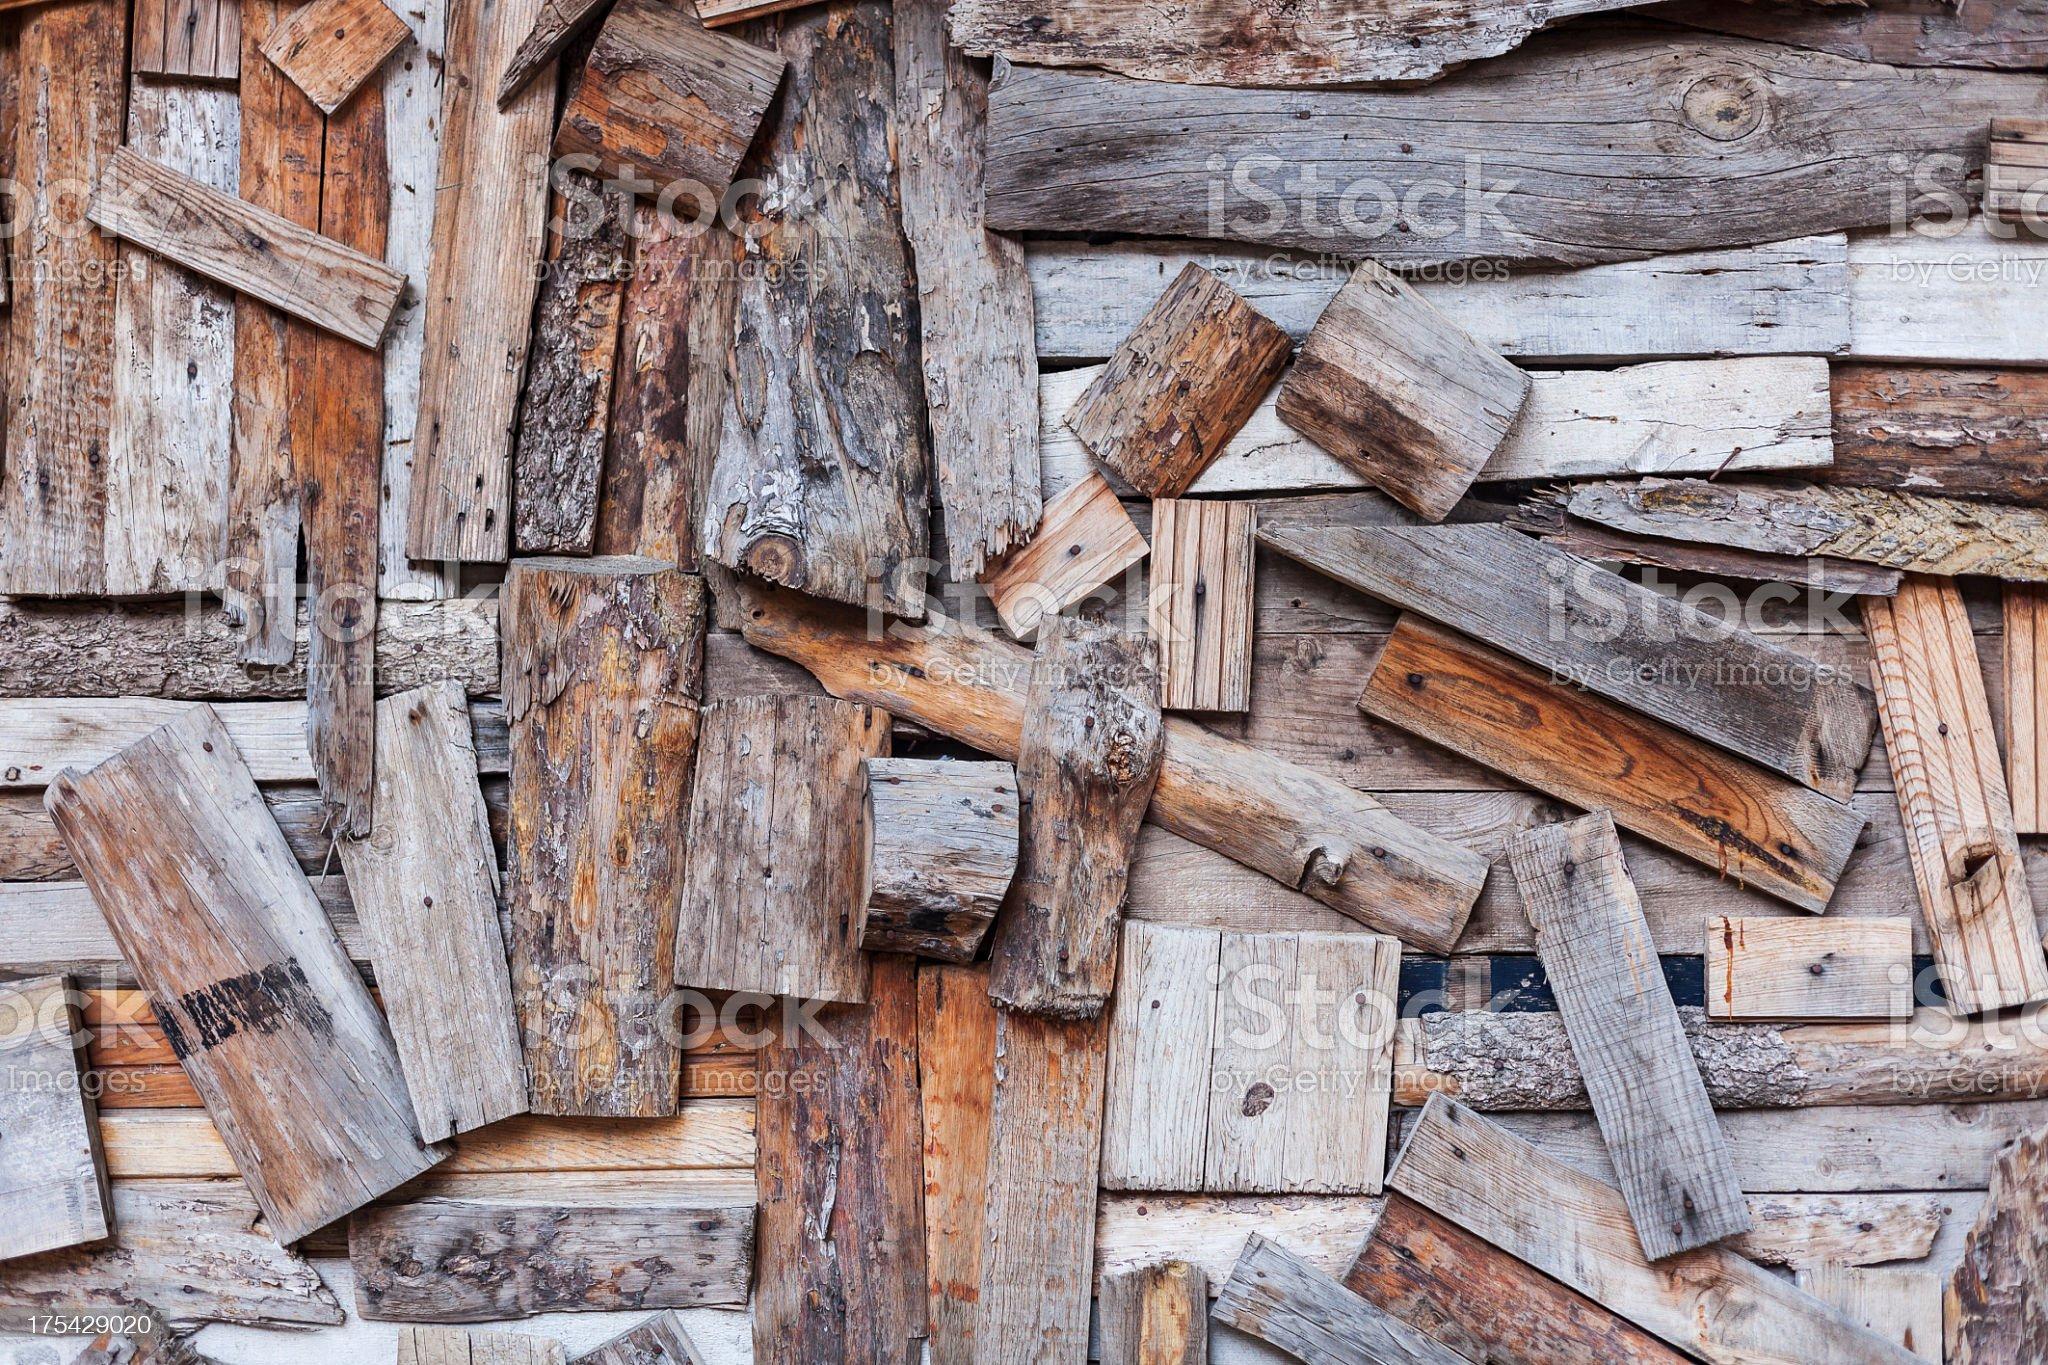 Abstract Wood Wall royalty-free stock photo